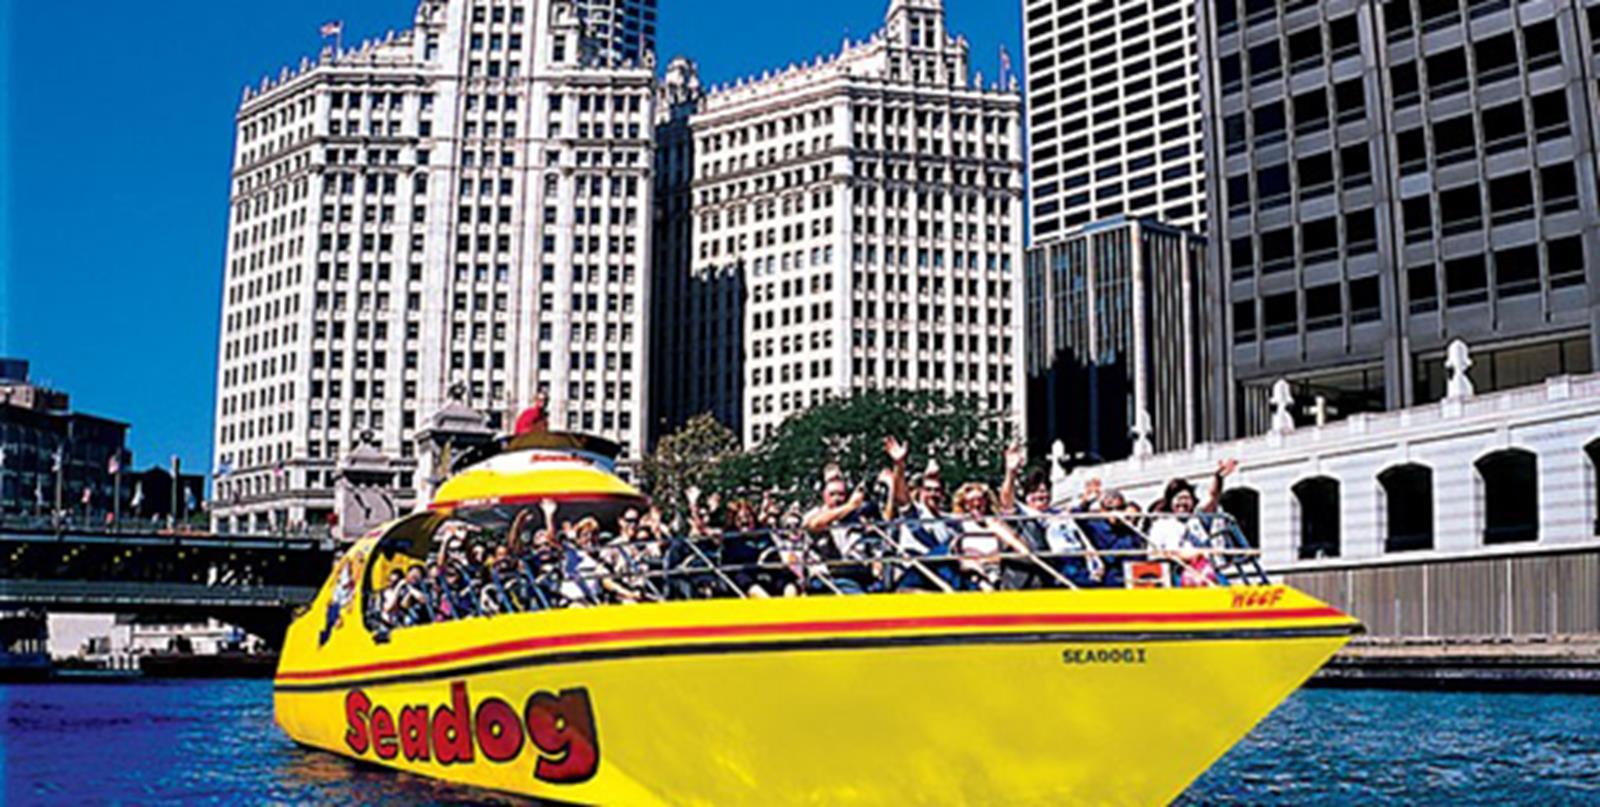 Seadog Cruises. Credit